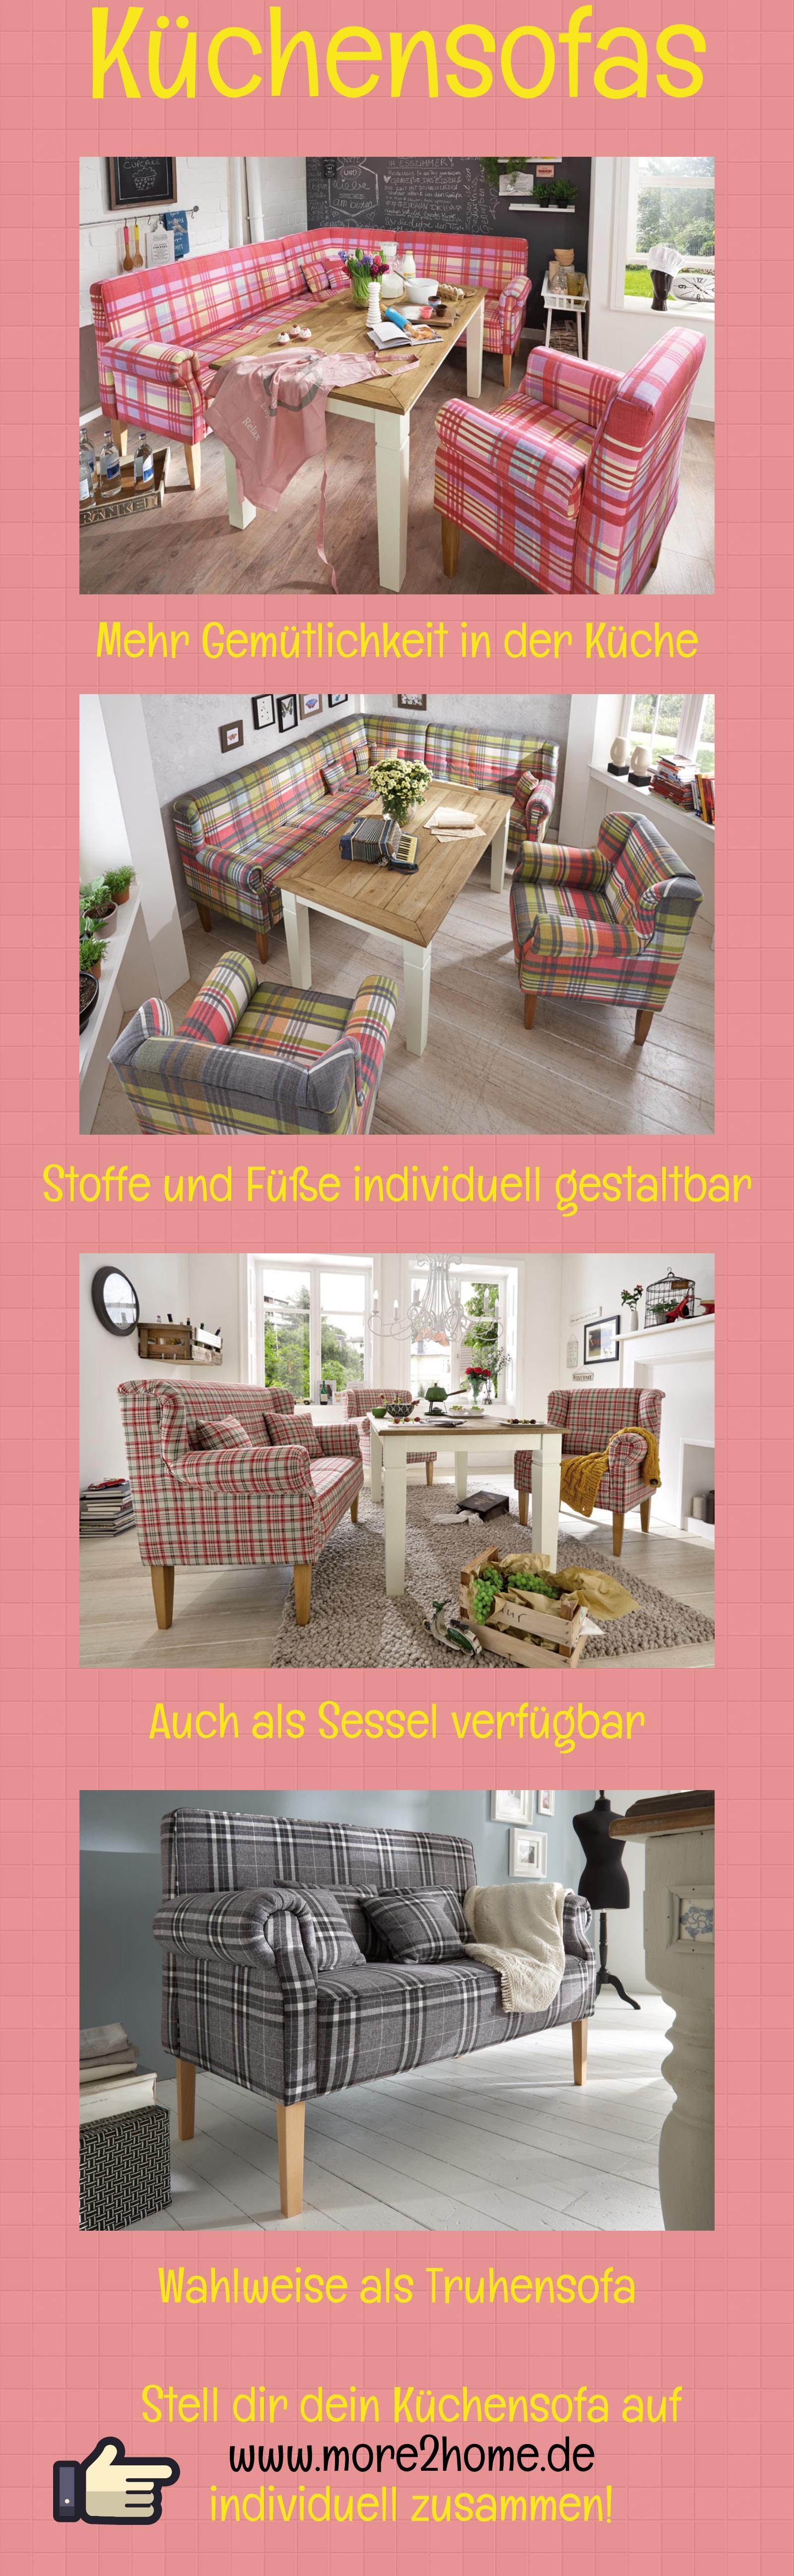 Wohnideen kuche landhaus for Kuchenmobel vintage look